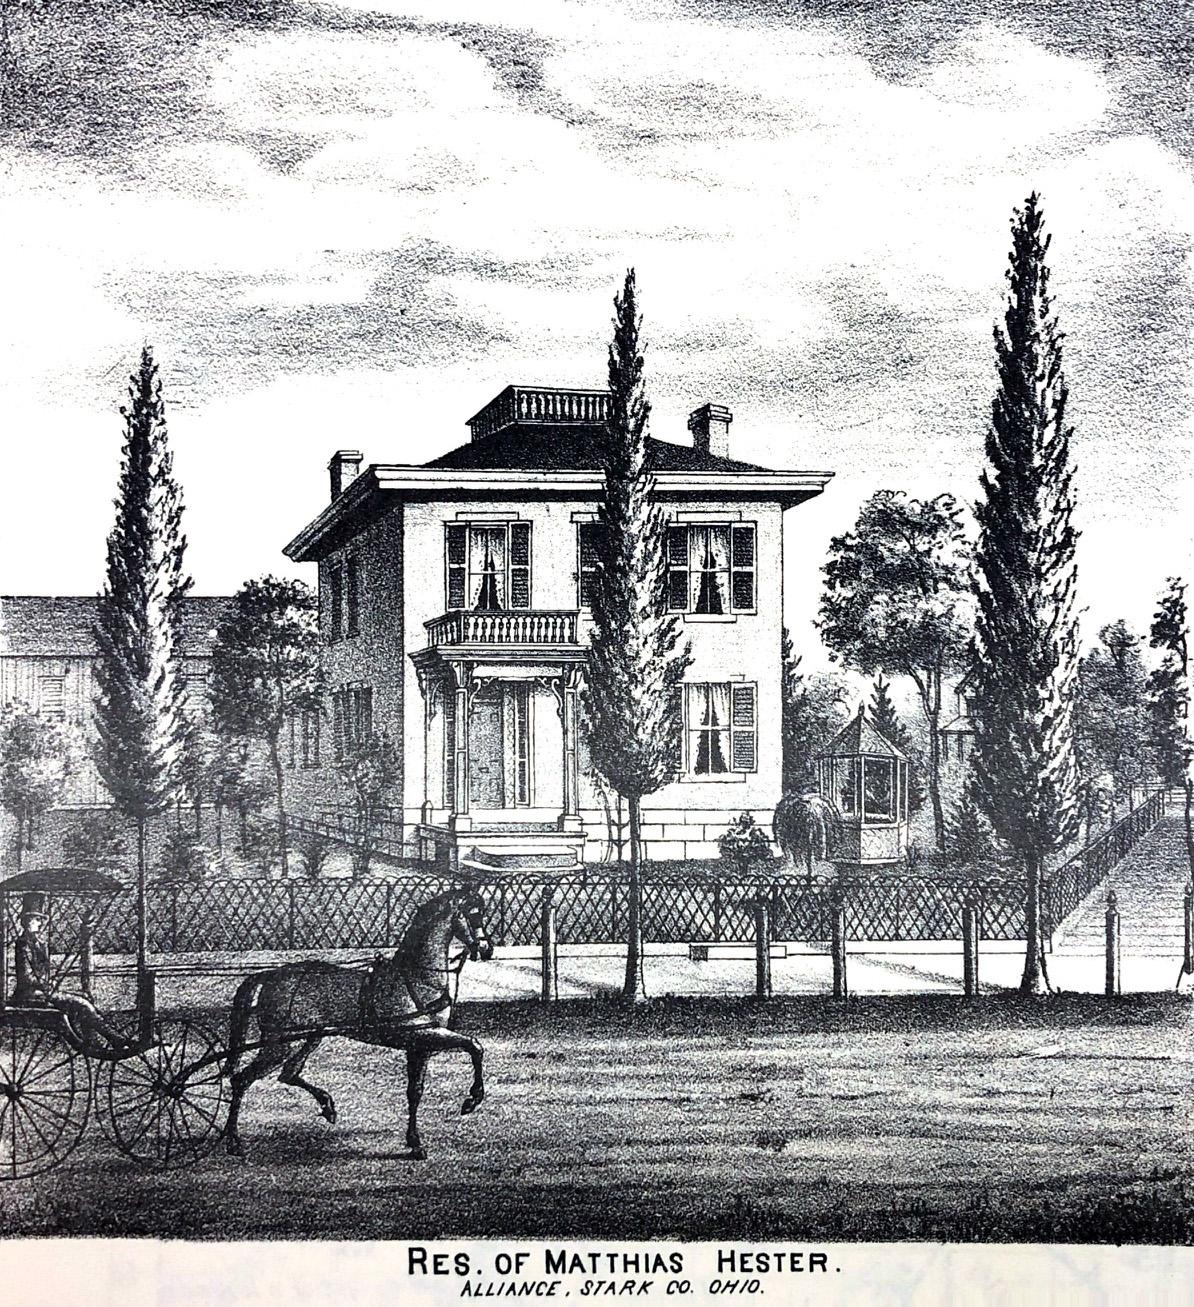 The residence of Mathias Hester, built in 1869, on the southwest corner of N. Mechanic Avenue and Hester Avenue